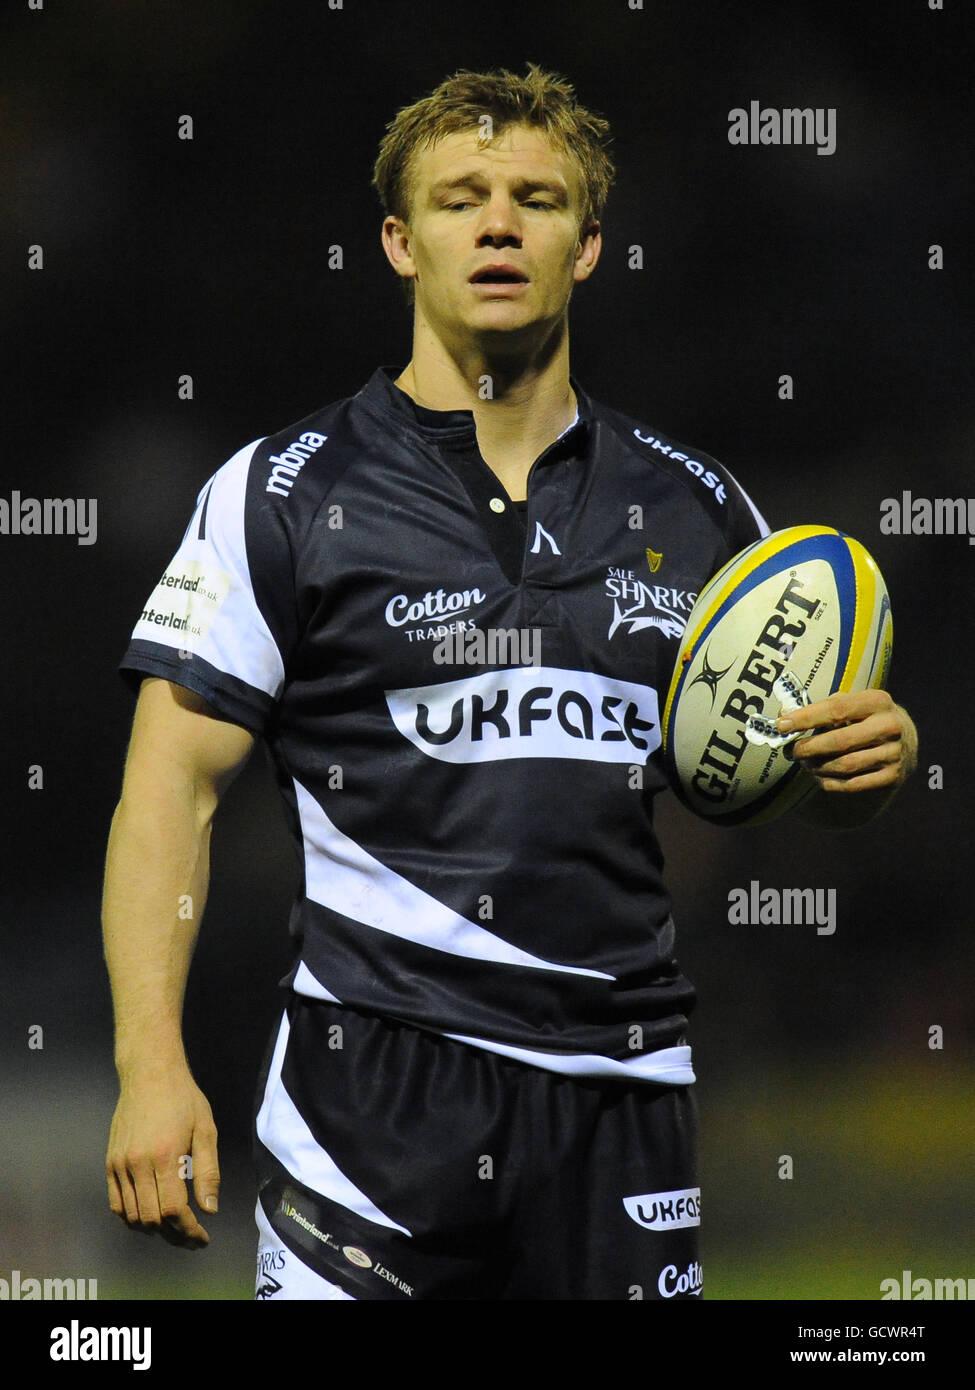 72c22e1f431 Rugby Union - Aviva Premiership - Sale Sharks v Northampton Saints -  Edgeley Park